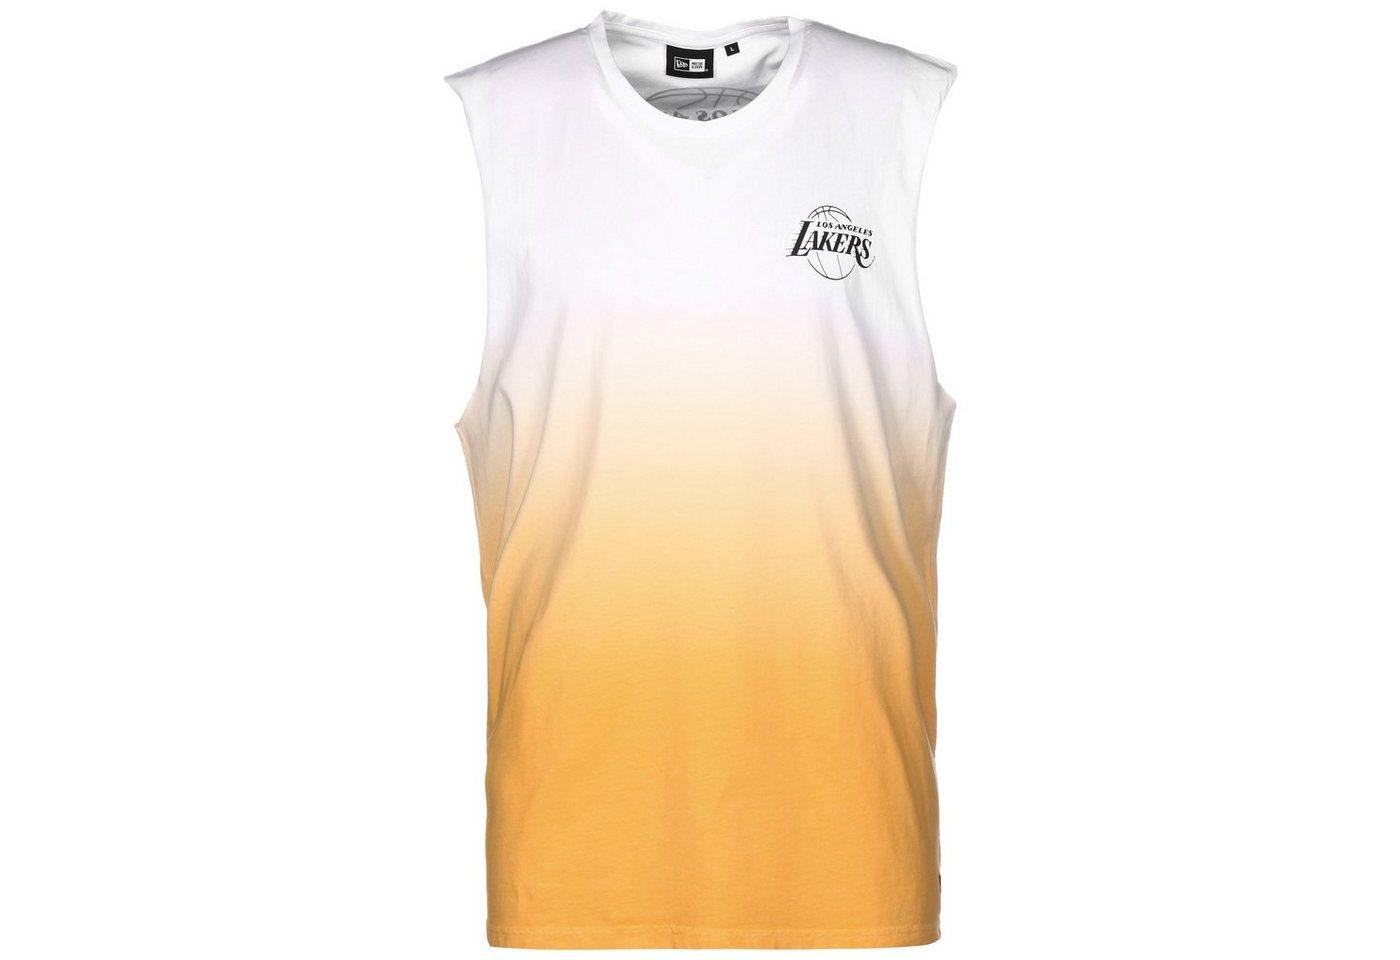 new era -  Tennisshirt »Nba Los Angeles Lakers Dip Dye«